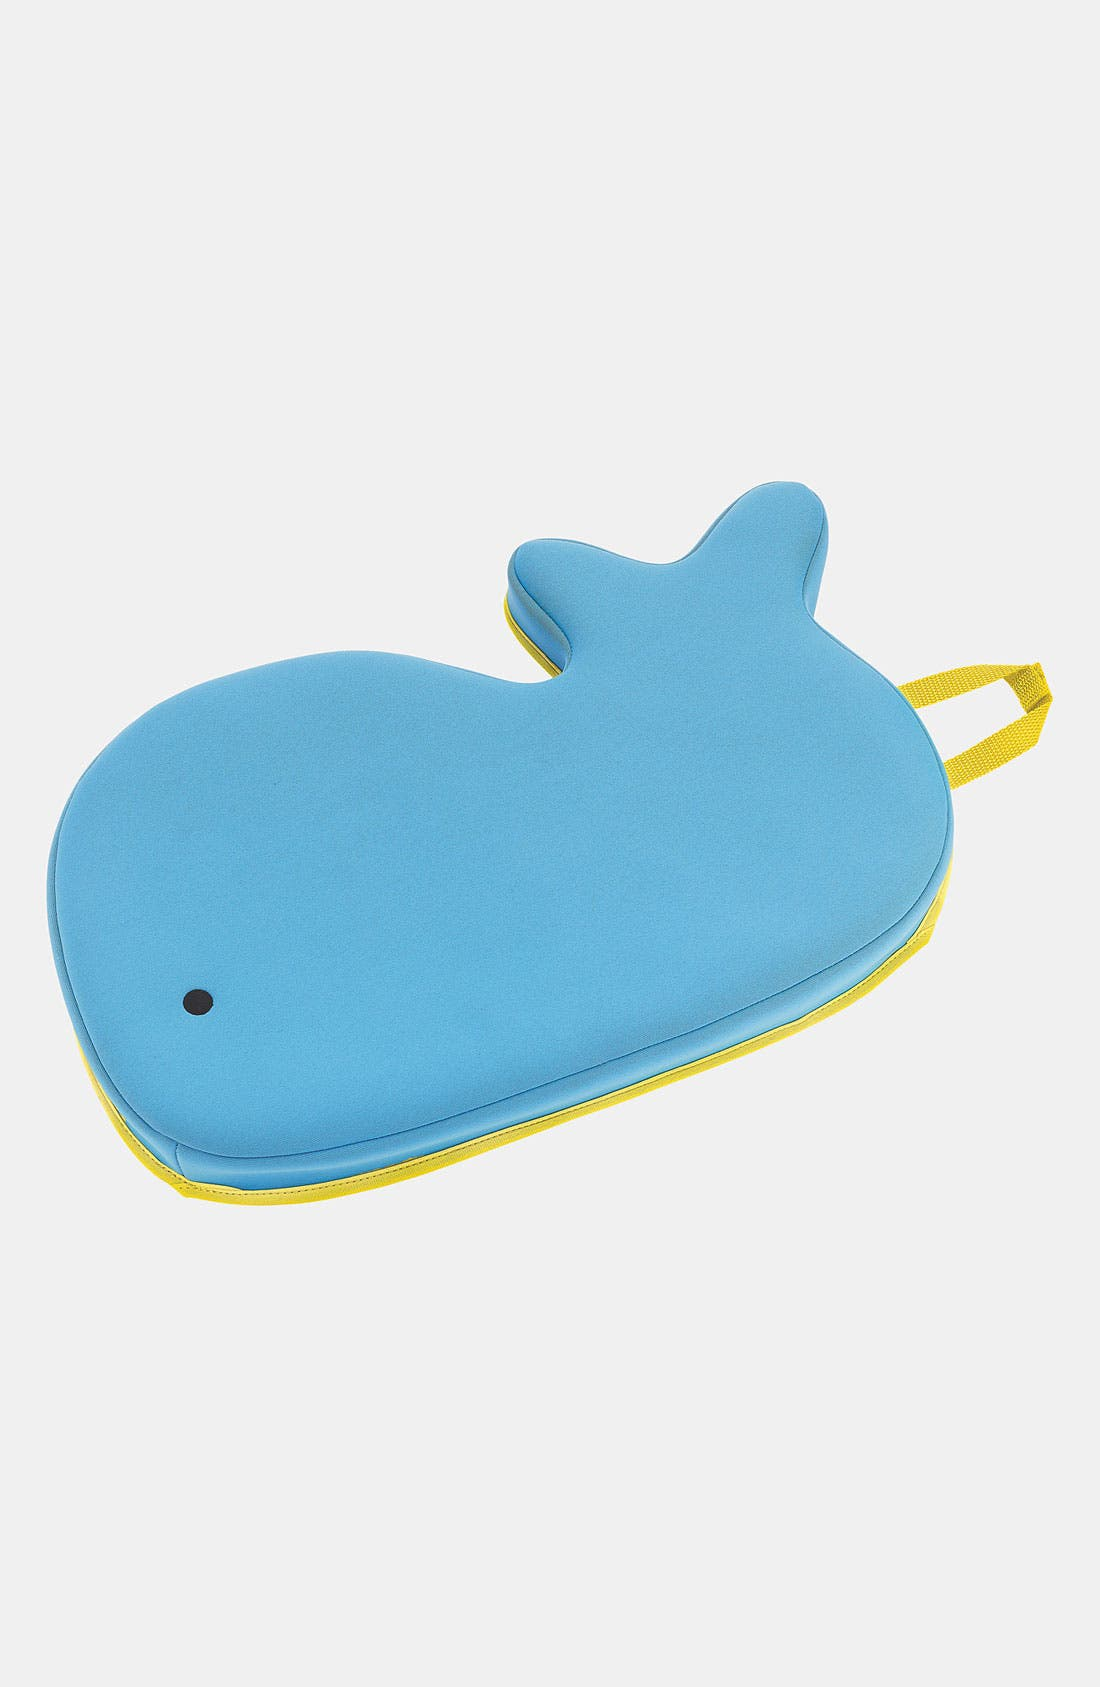 Skip Hop 'Moby' Bath Kneeler